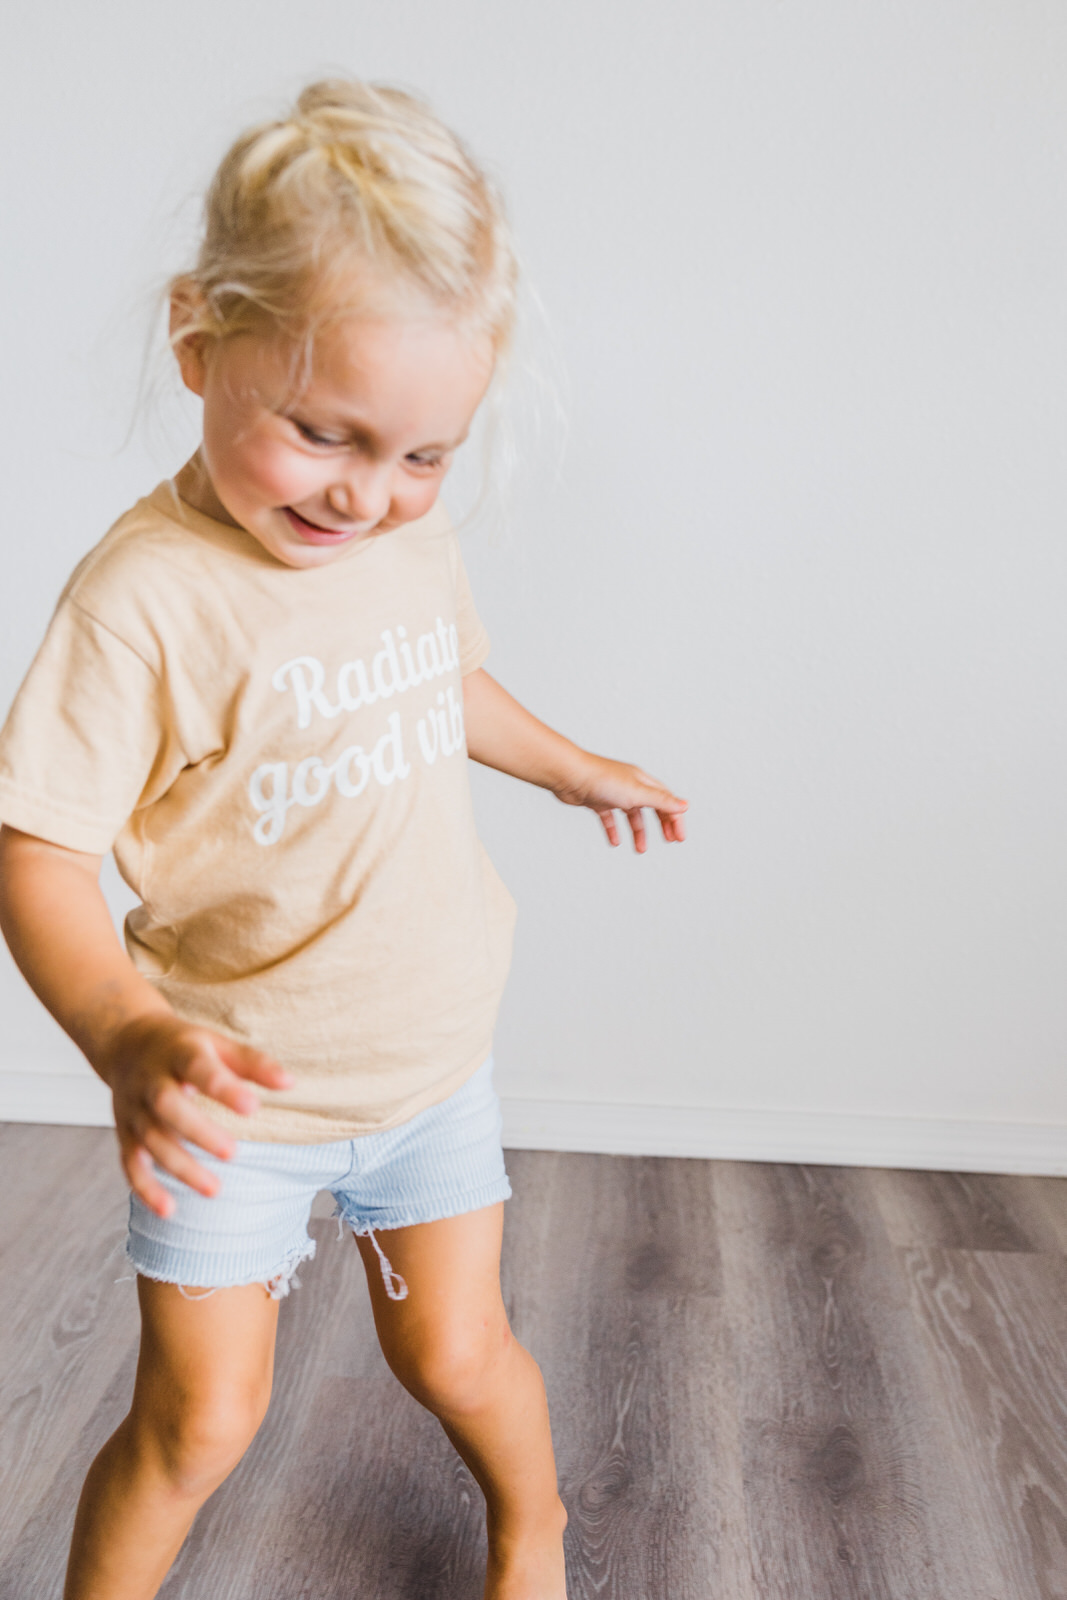 kids-clothes-small-business-collaboration-women-hawaii-7797.jpg